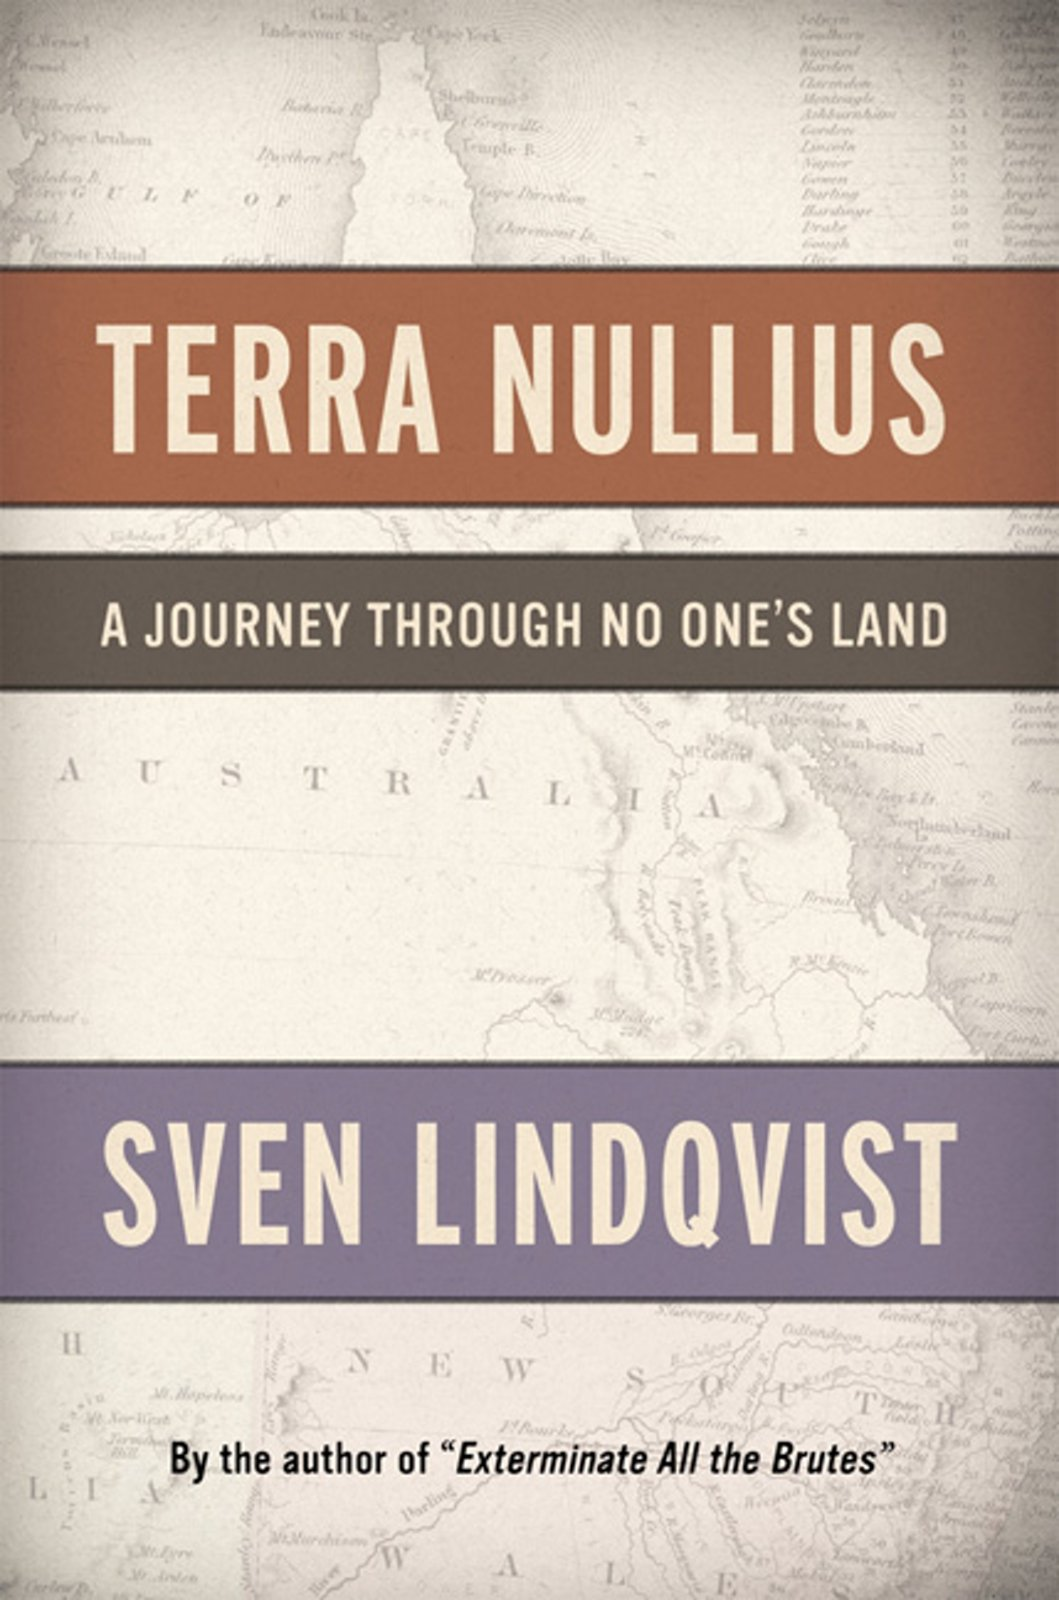 Amazoncom Terra Nullius A Journey Through No Ones Land KZSdRYKL